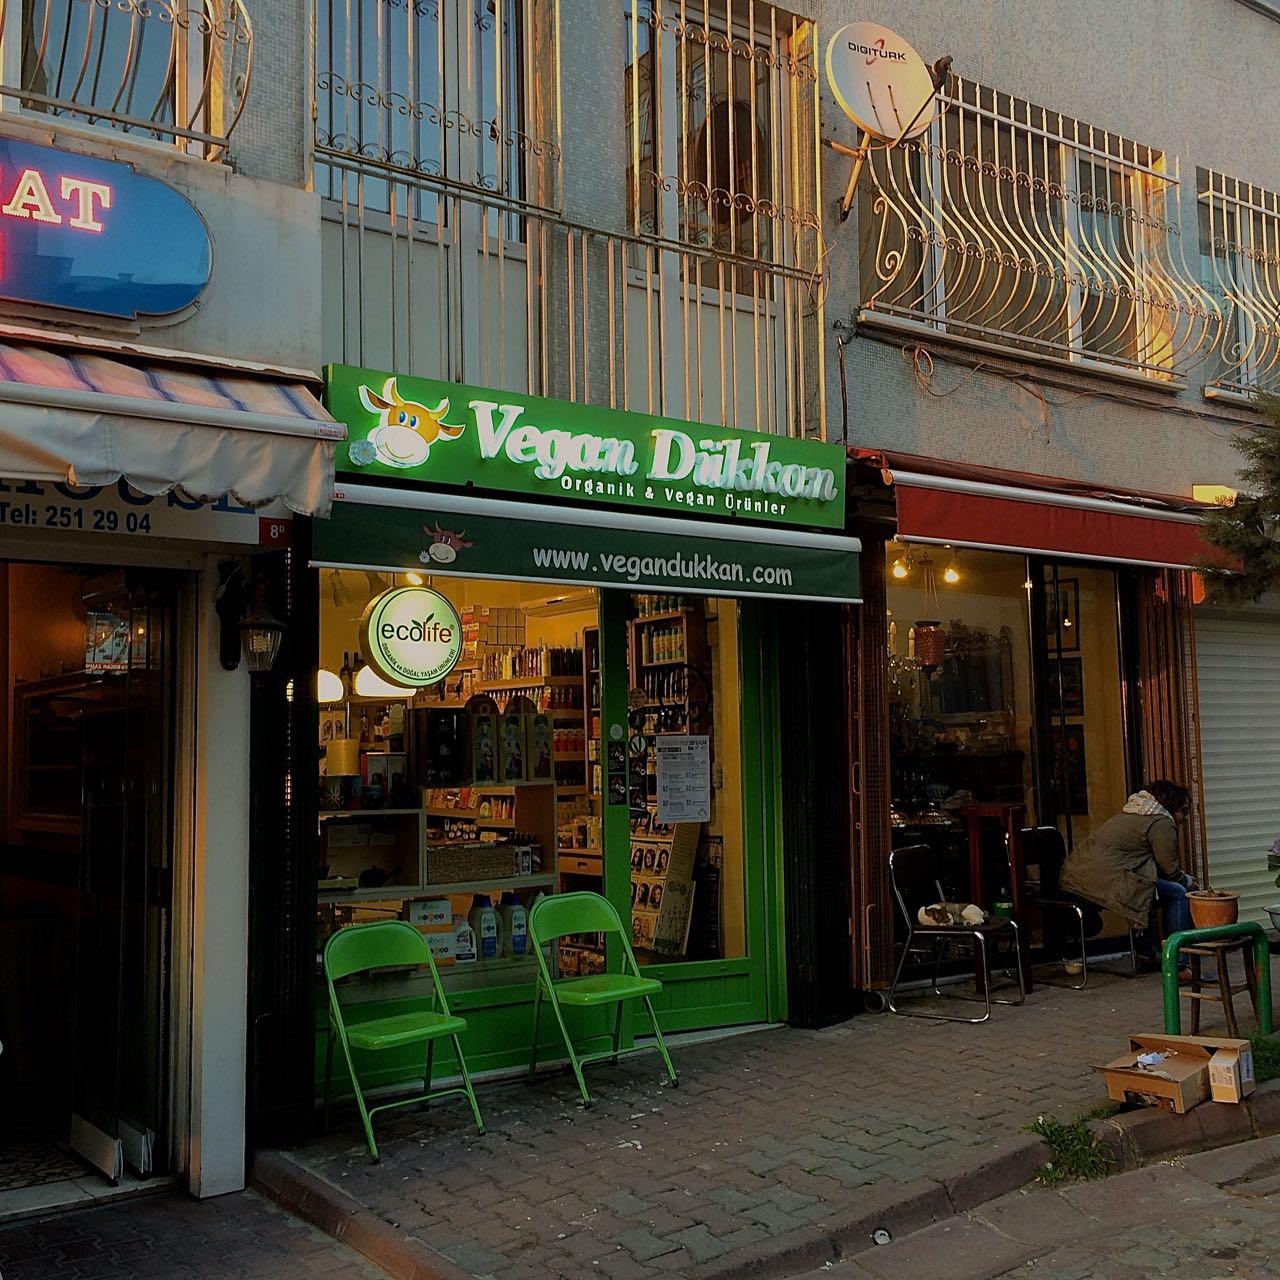 http://i0.wp.com/fatgayvegan.com/wp-content/uploads/2015/05/Istanbul01.jpg?fit=1280%2C1280